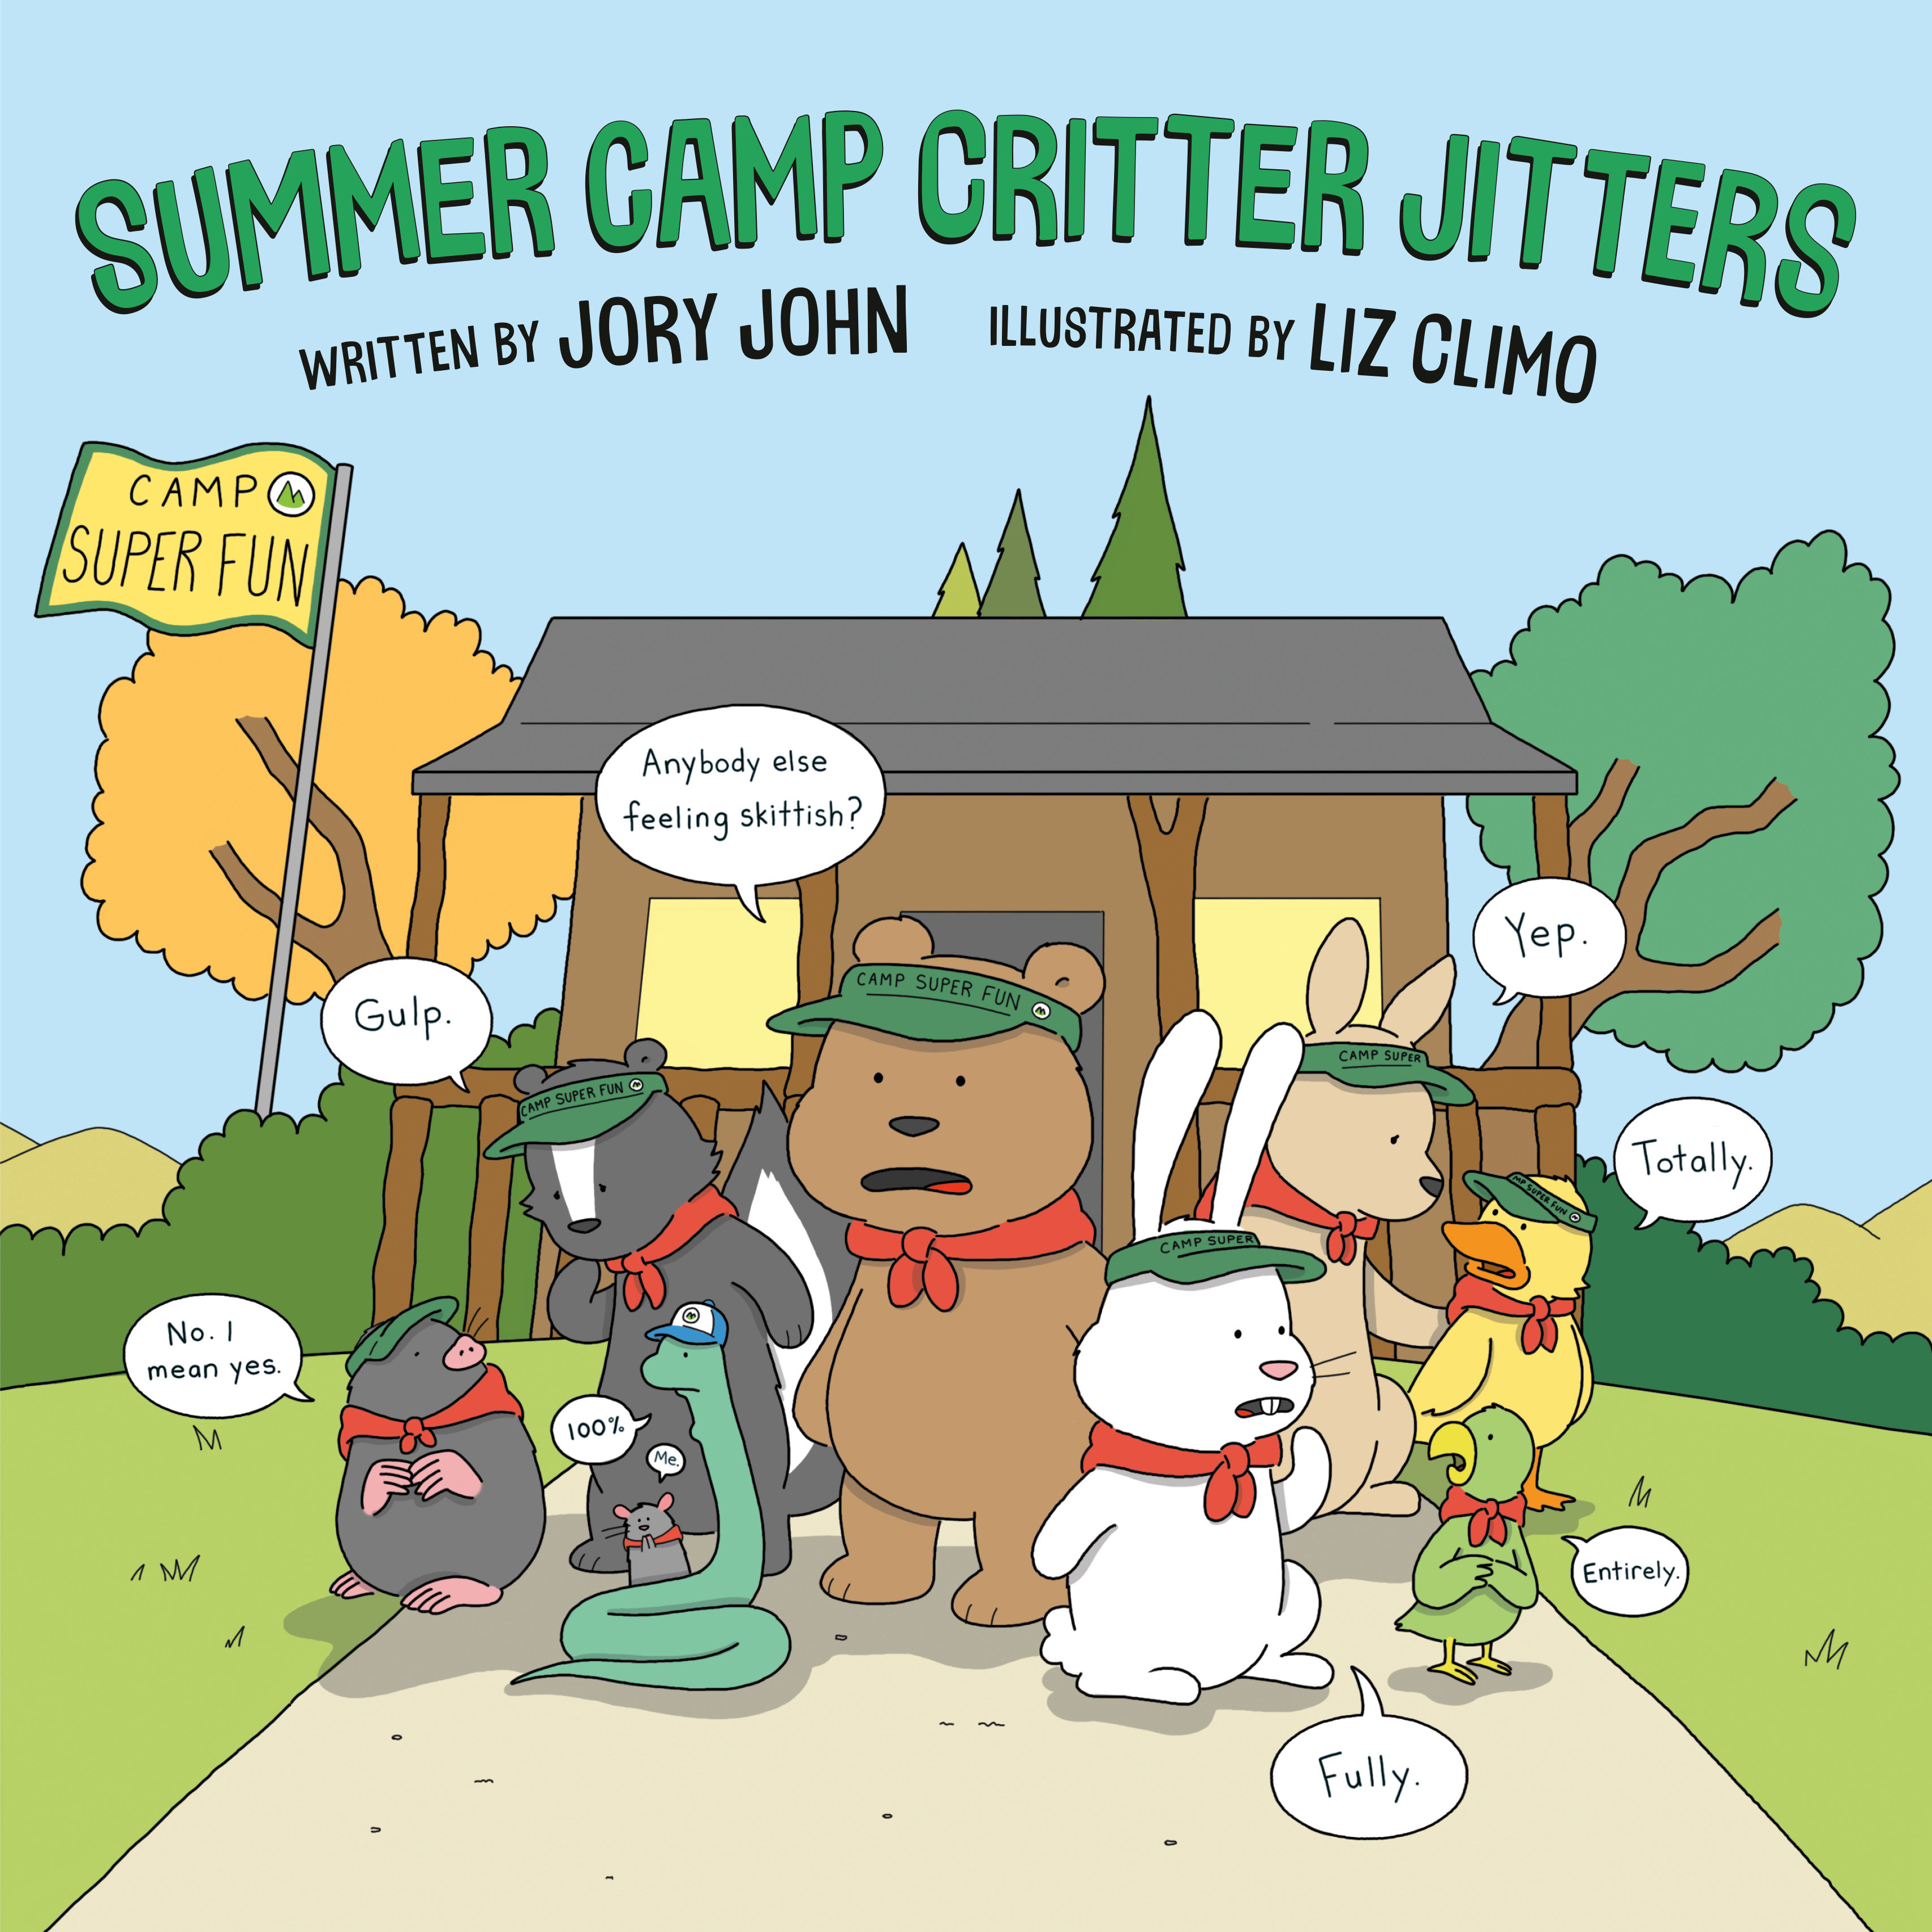 Summer Camp Critter Jitters